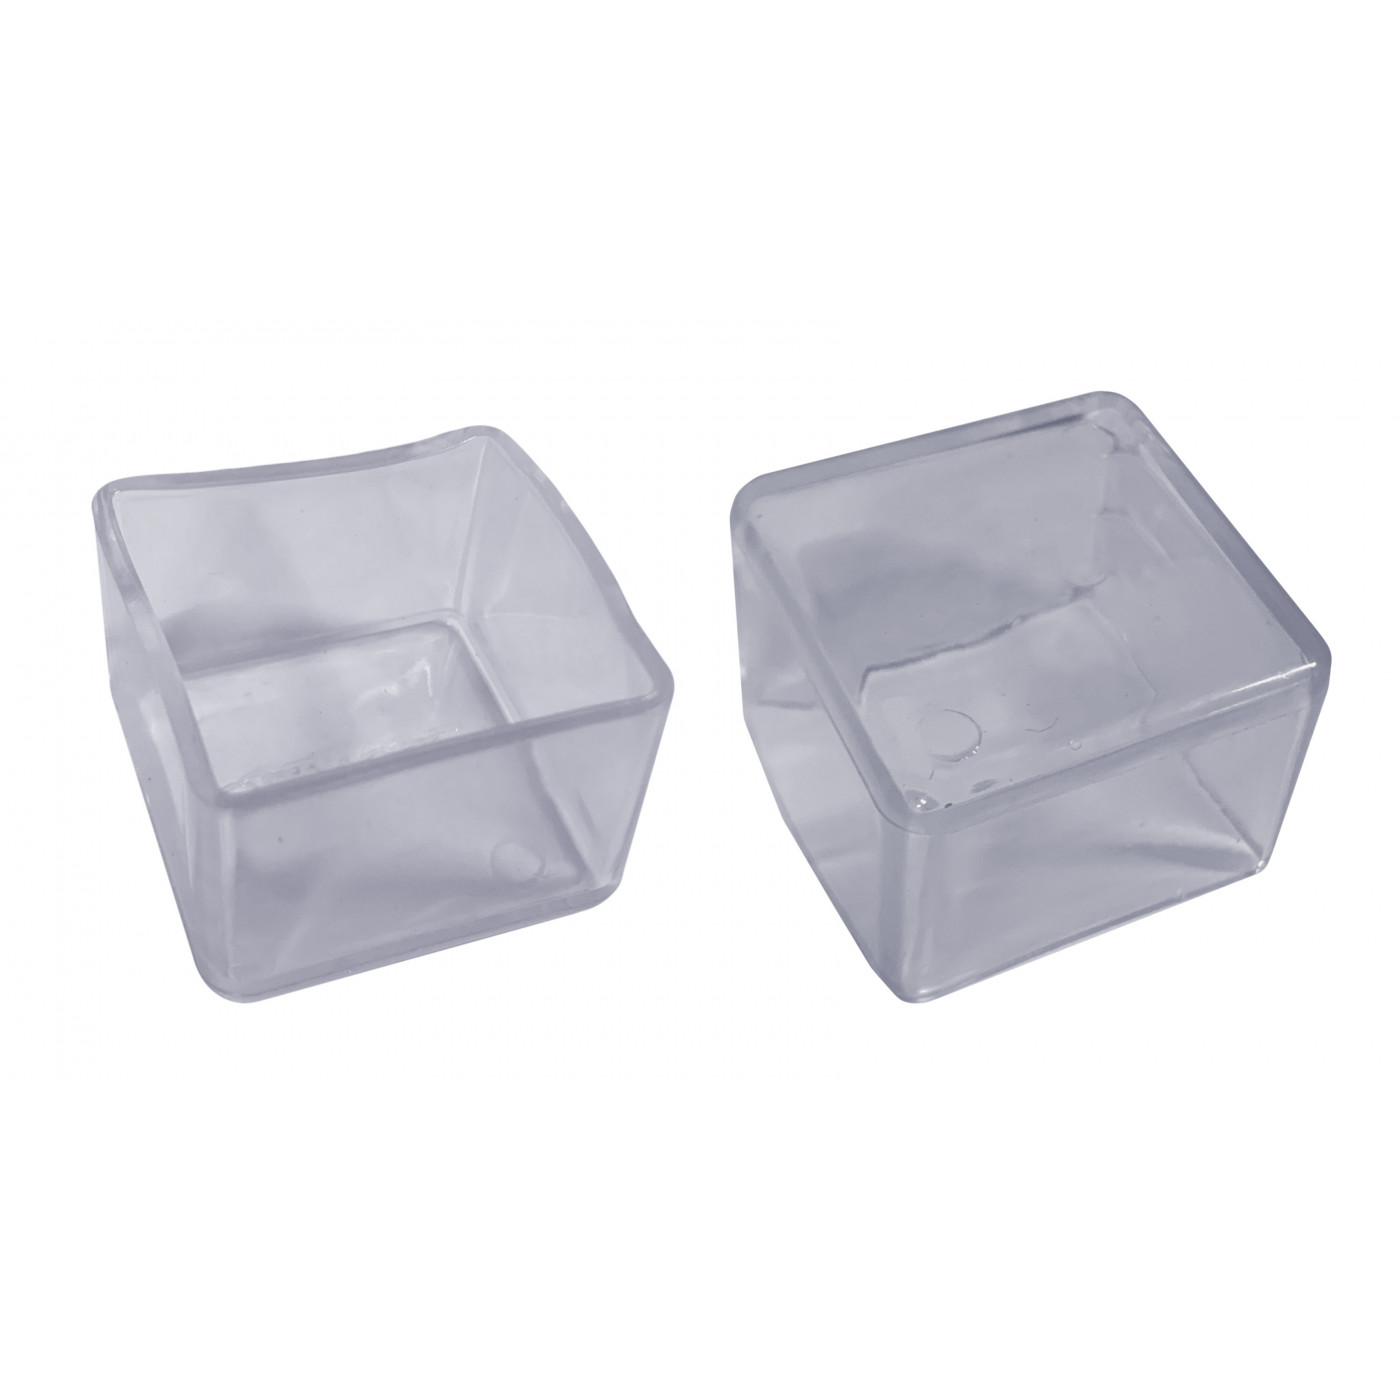 Set von 32 silikonkappen (Außenkappe, Quadrat, 30 mm